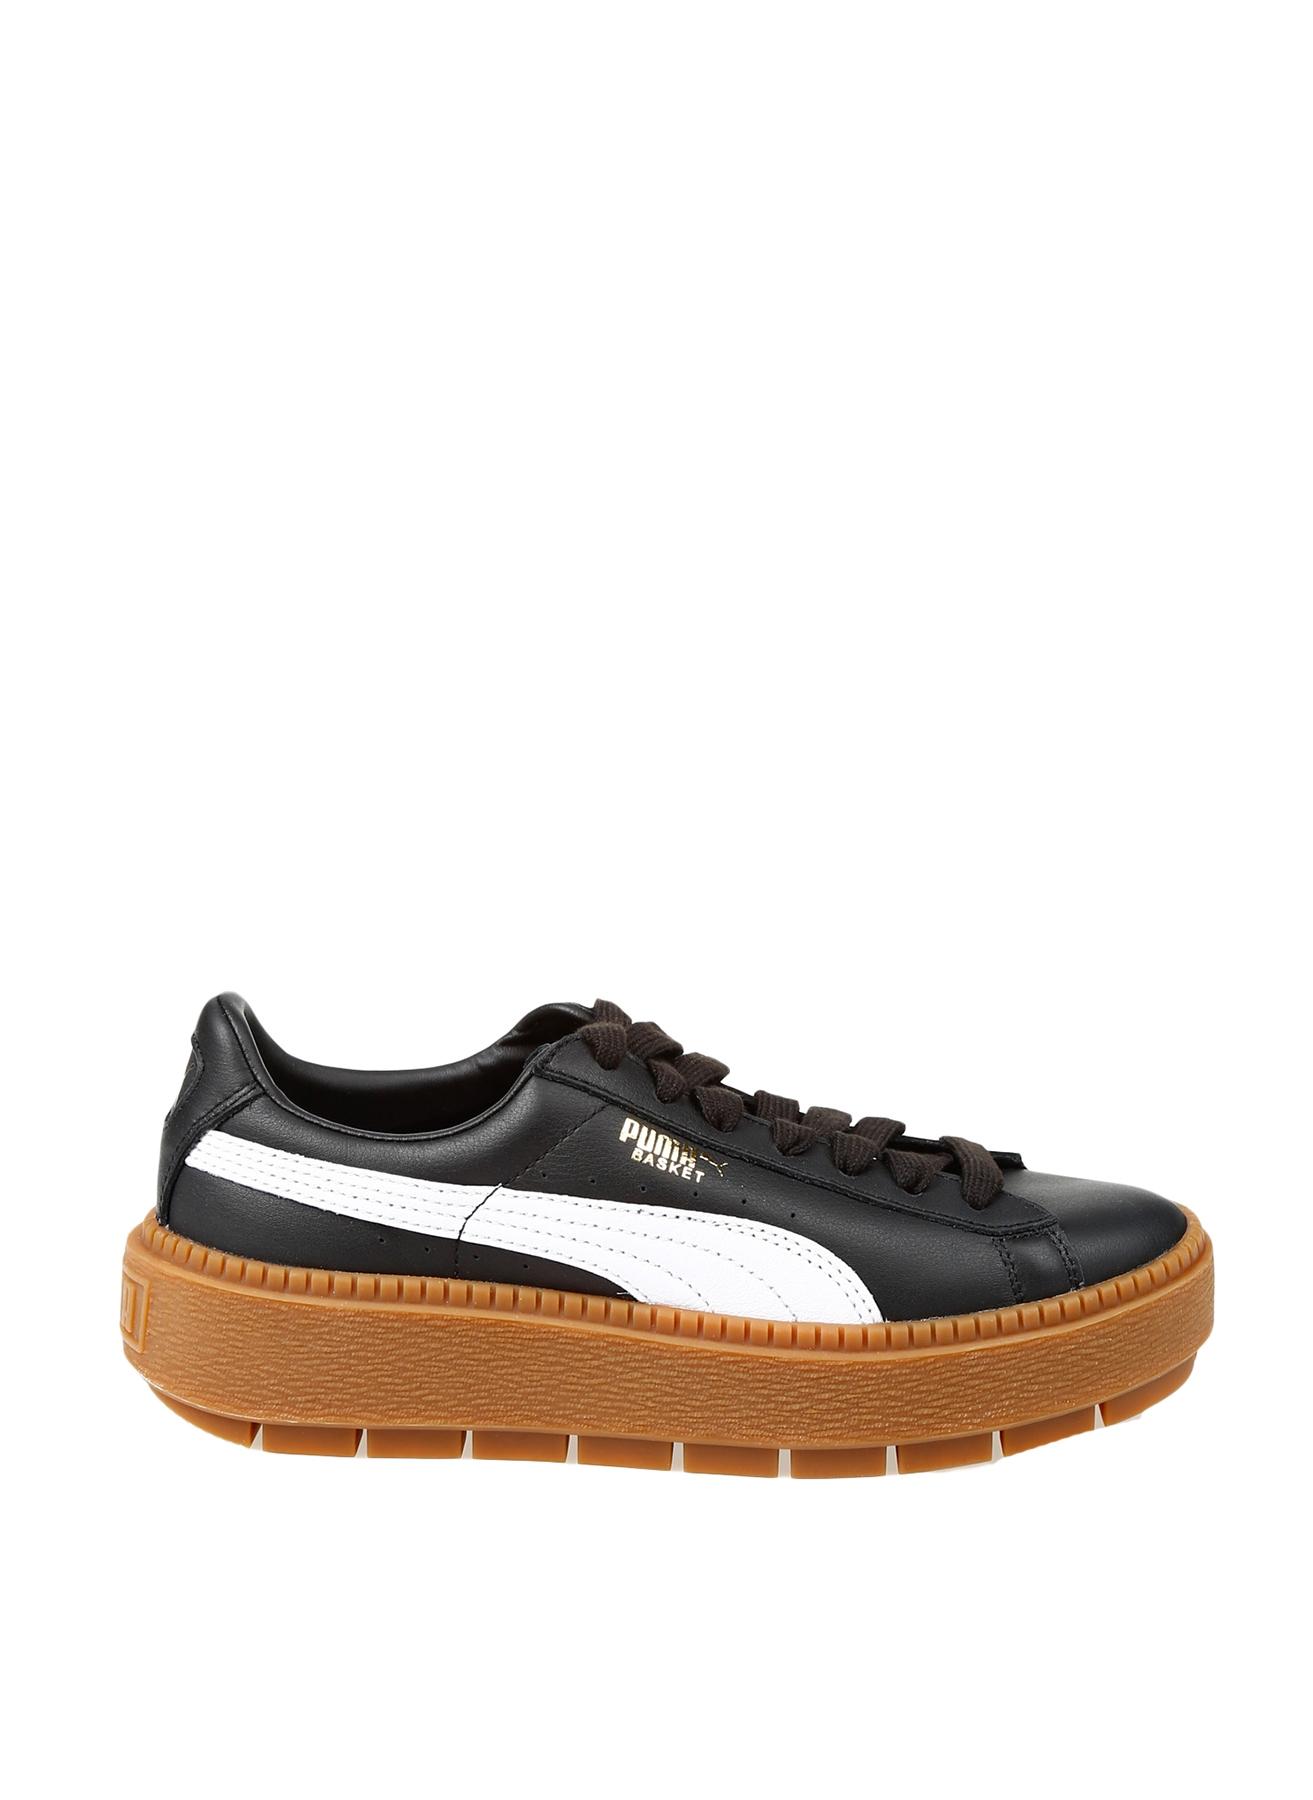 Puma Platform Trace L Wn S Lifestyle Ayakkabı 37.5 5000428634003 Ürün Resmi